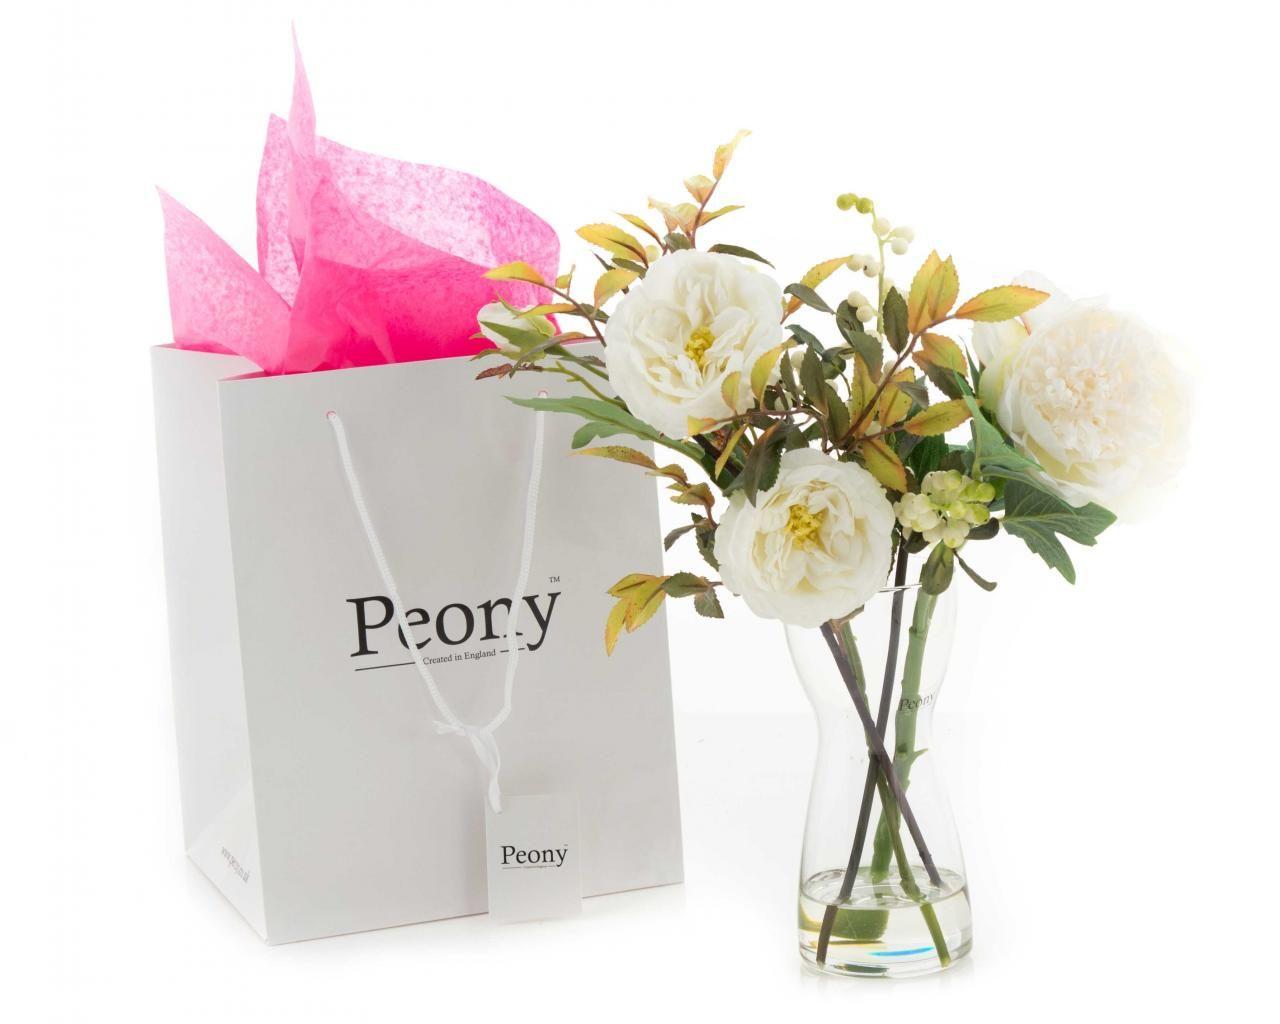 Peony buy large artifical plant silk flower arrangements online peony buy large artifical plant silk flower arrangements online izmirmasajfo